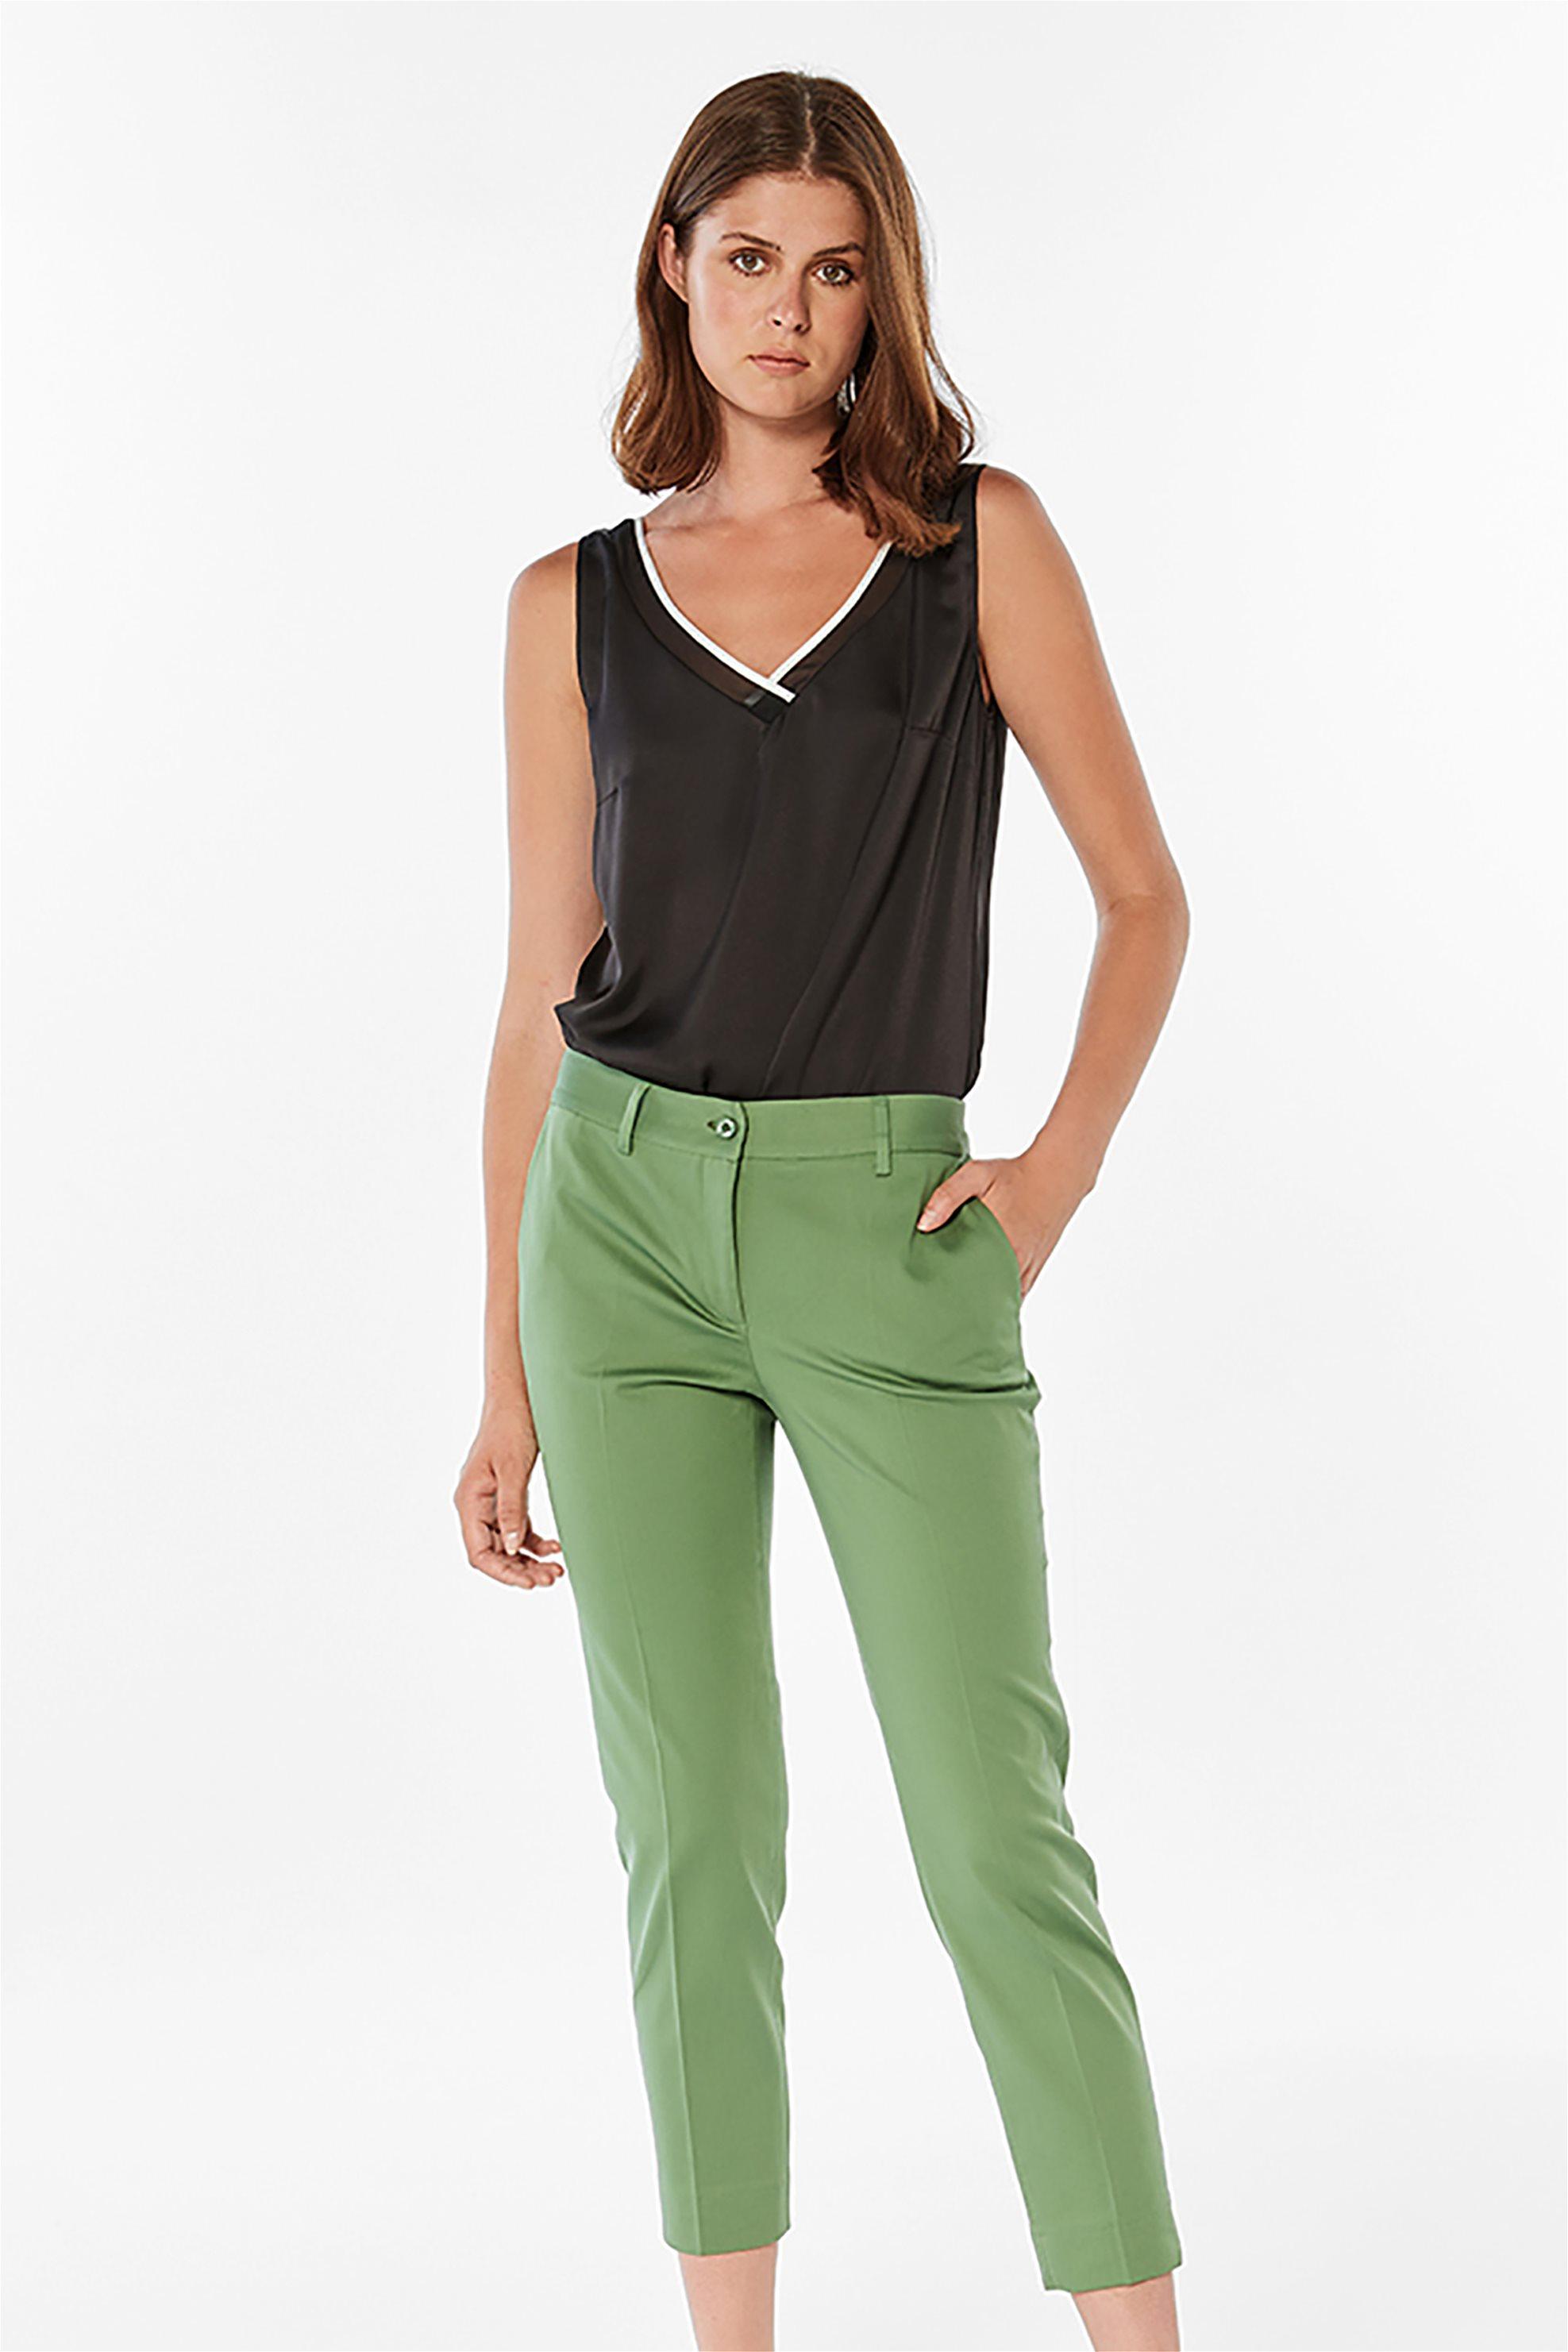 Bella P γυναικείο παντελόνι cropped μονόχρωμο - 21.211.Β03.110 - Πράσινο